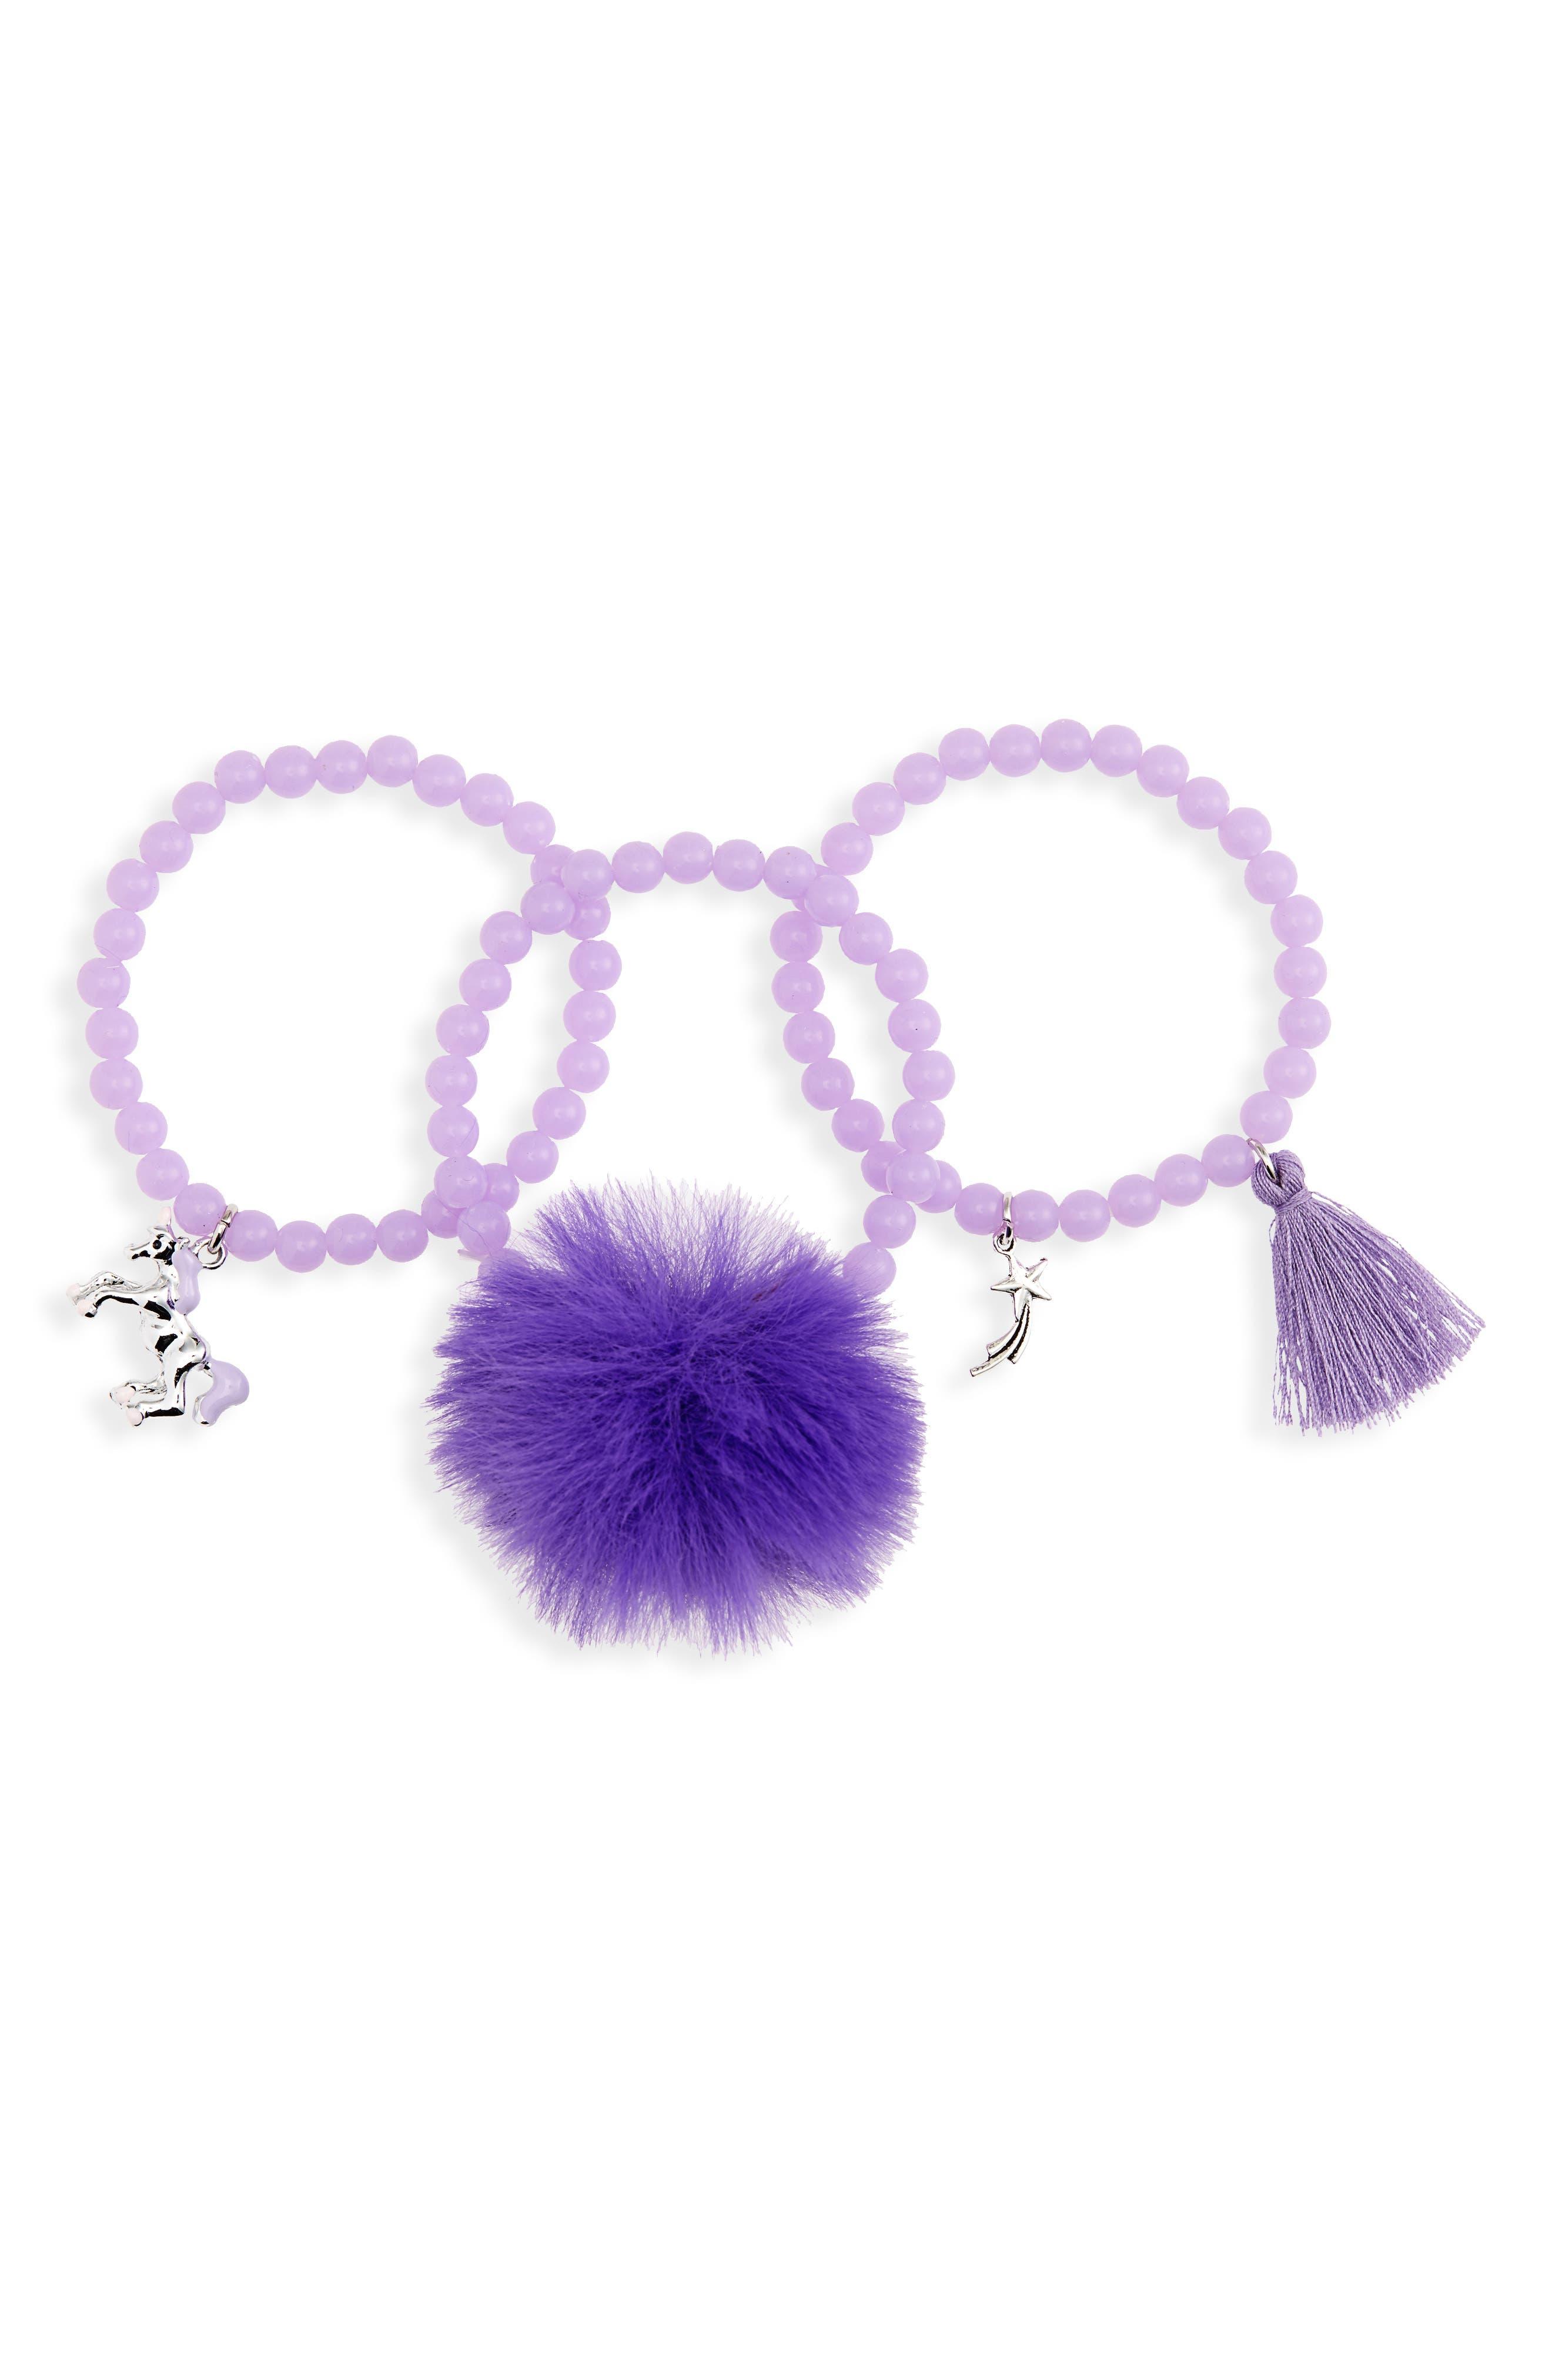 3-Pack Beaded Charm Bracelets,                             Main thumbnail 1, color,                             PURPLE